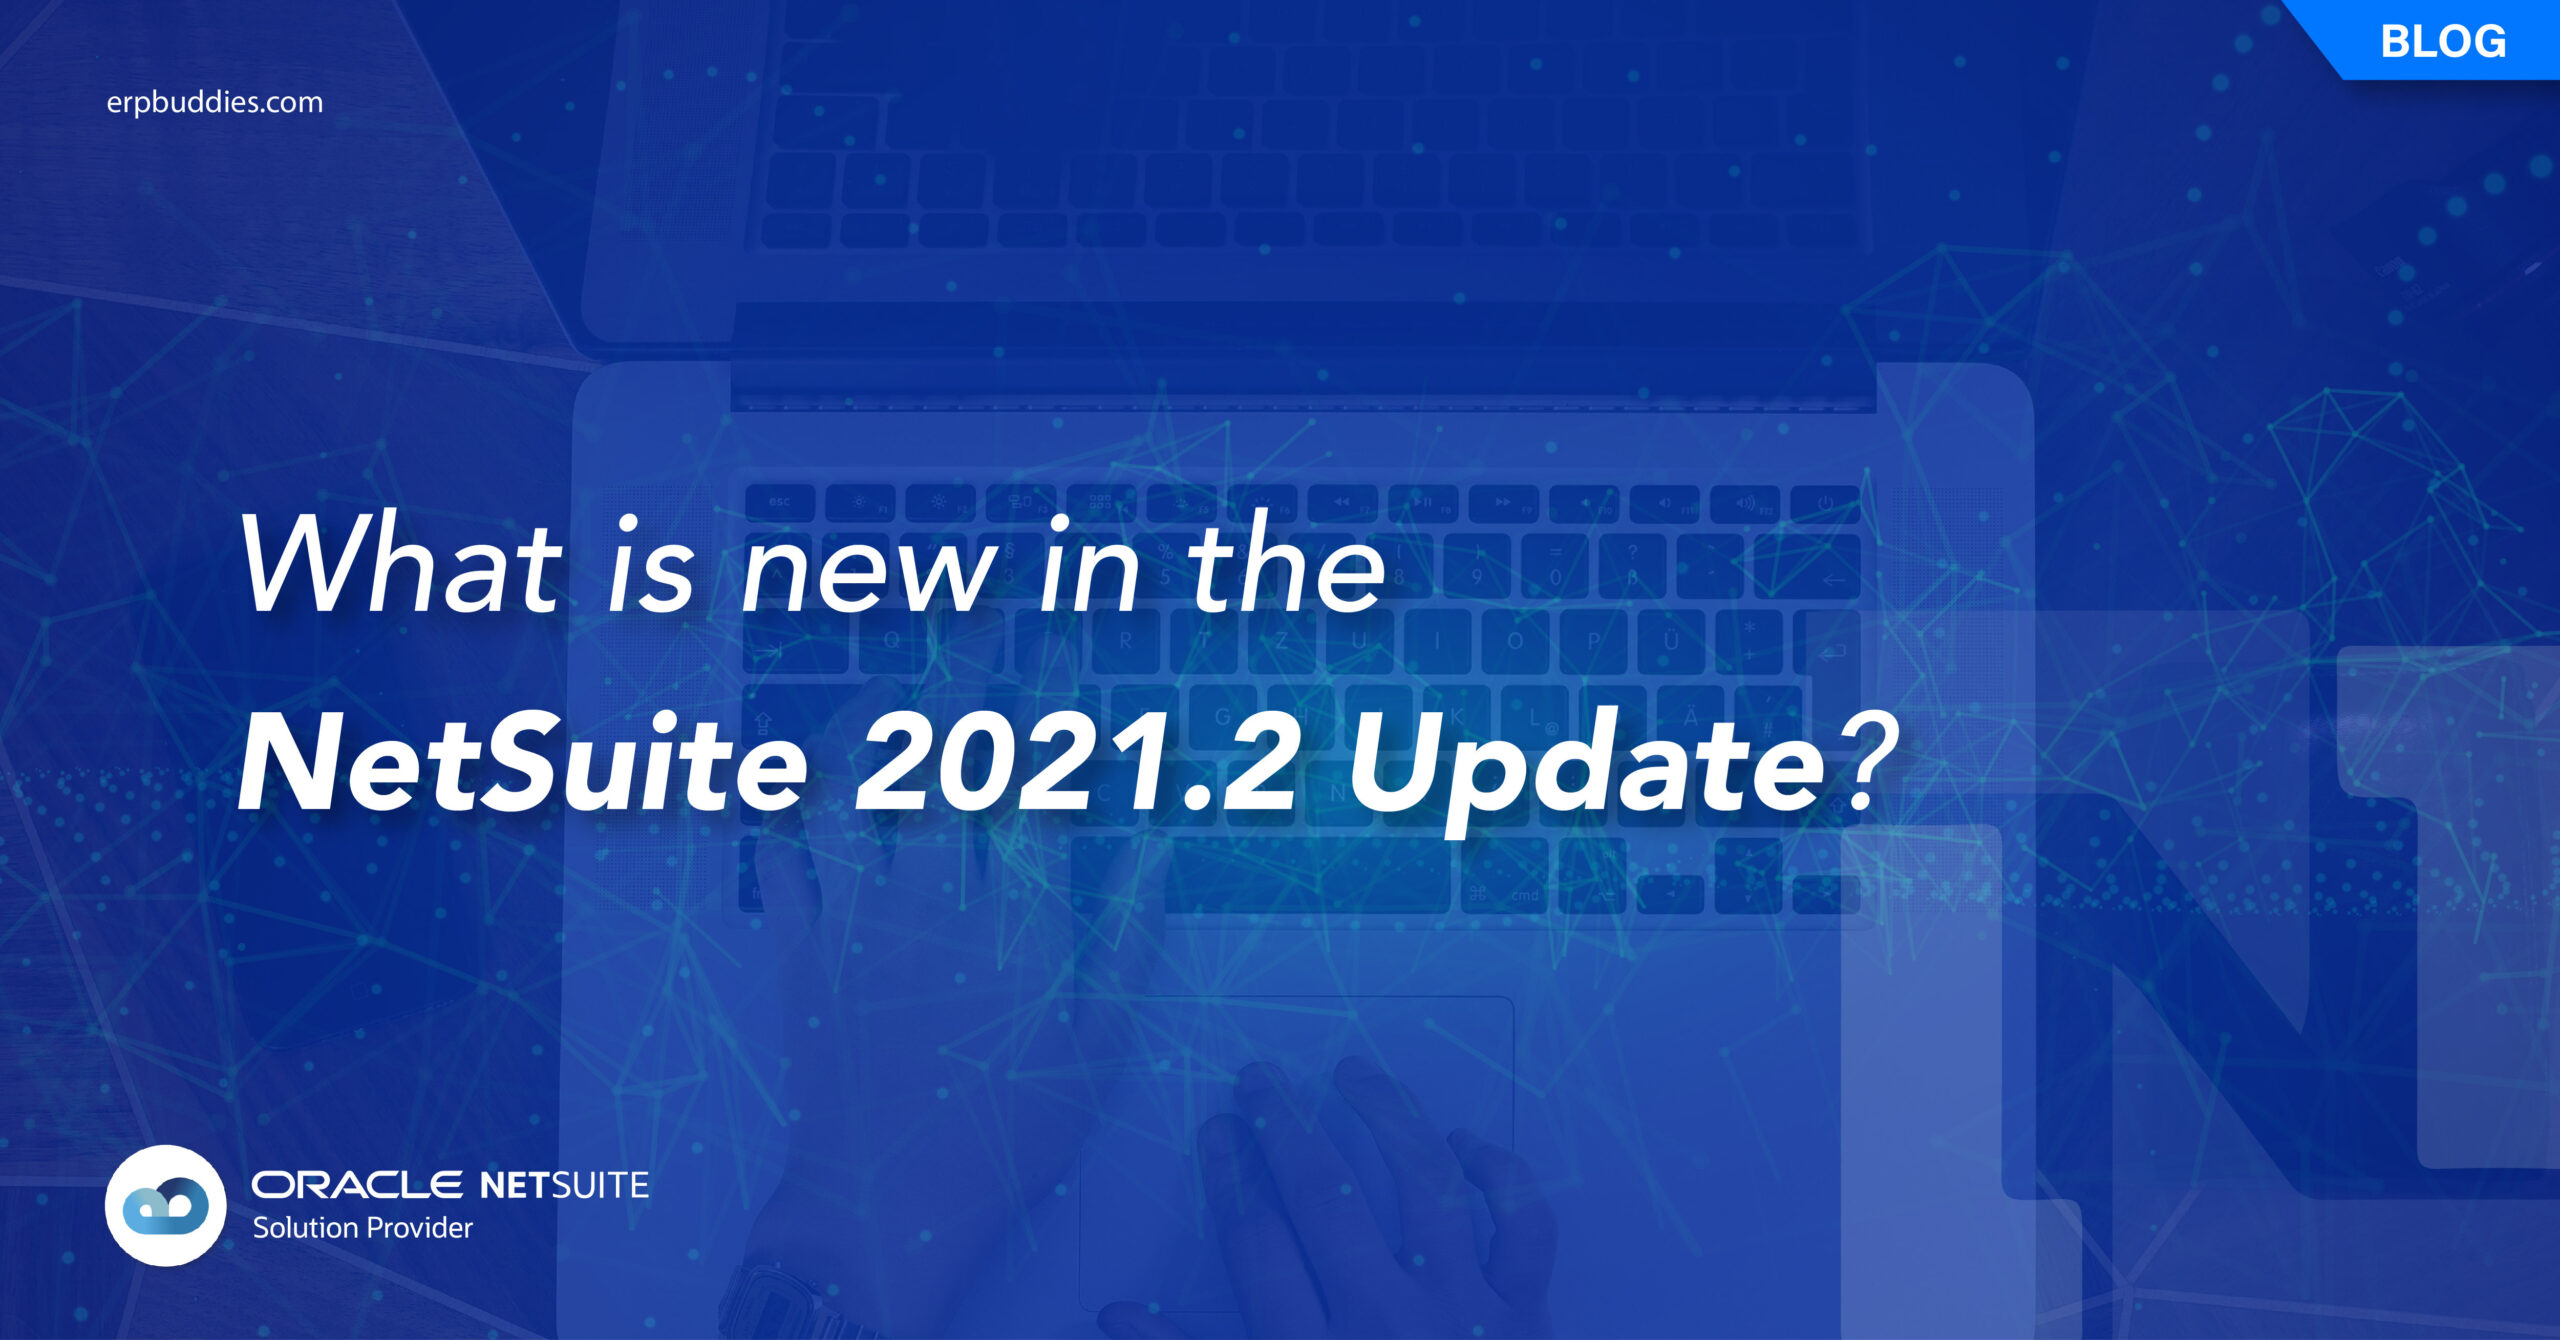 netsuite 2021.2 update